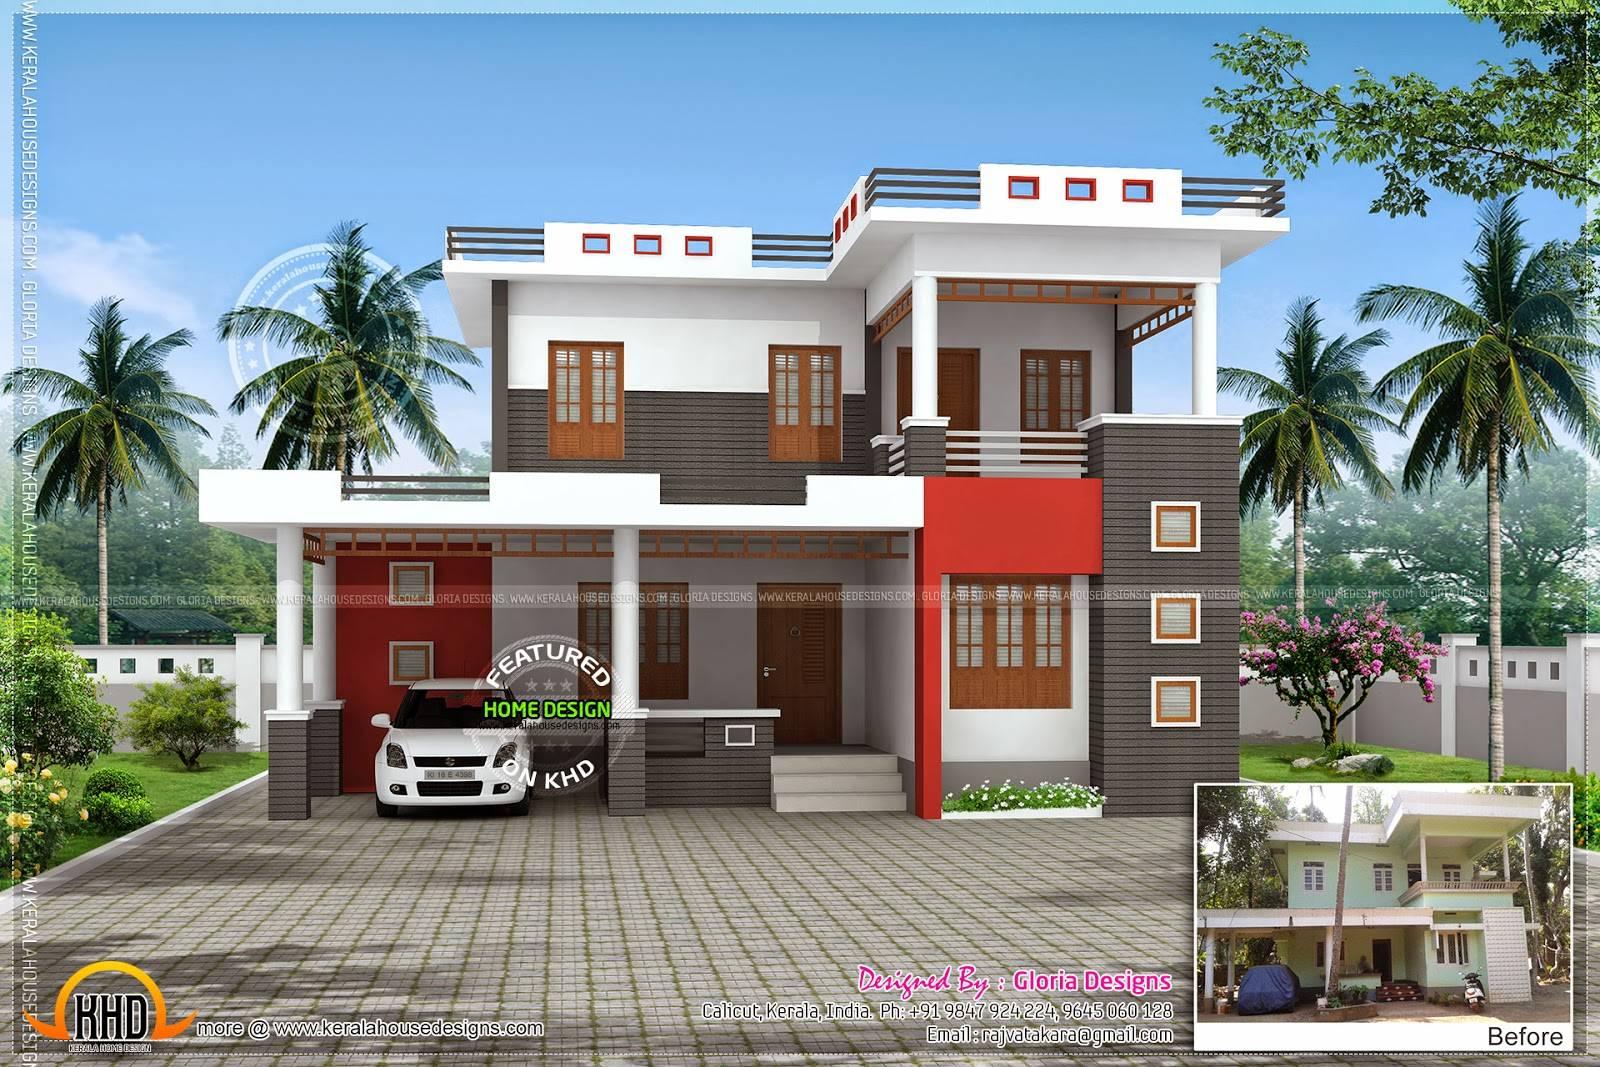 Model Old House Kerala Home Design Floor Plans Home Plans Blueprints 30133